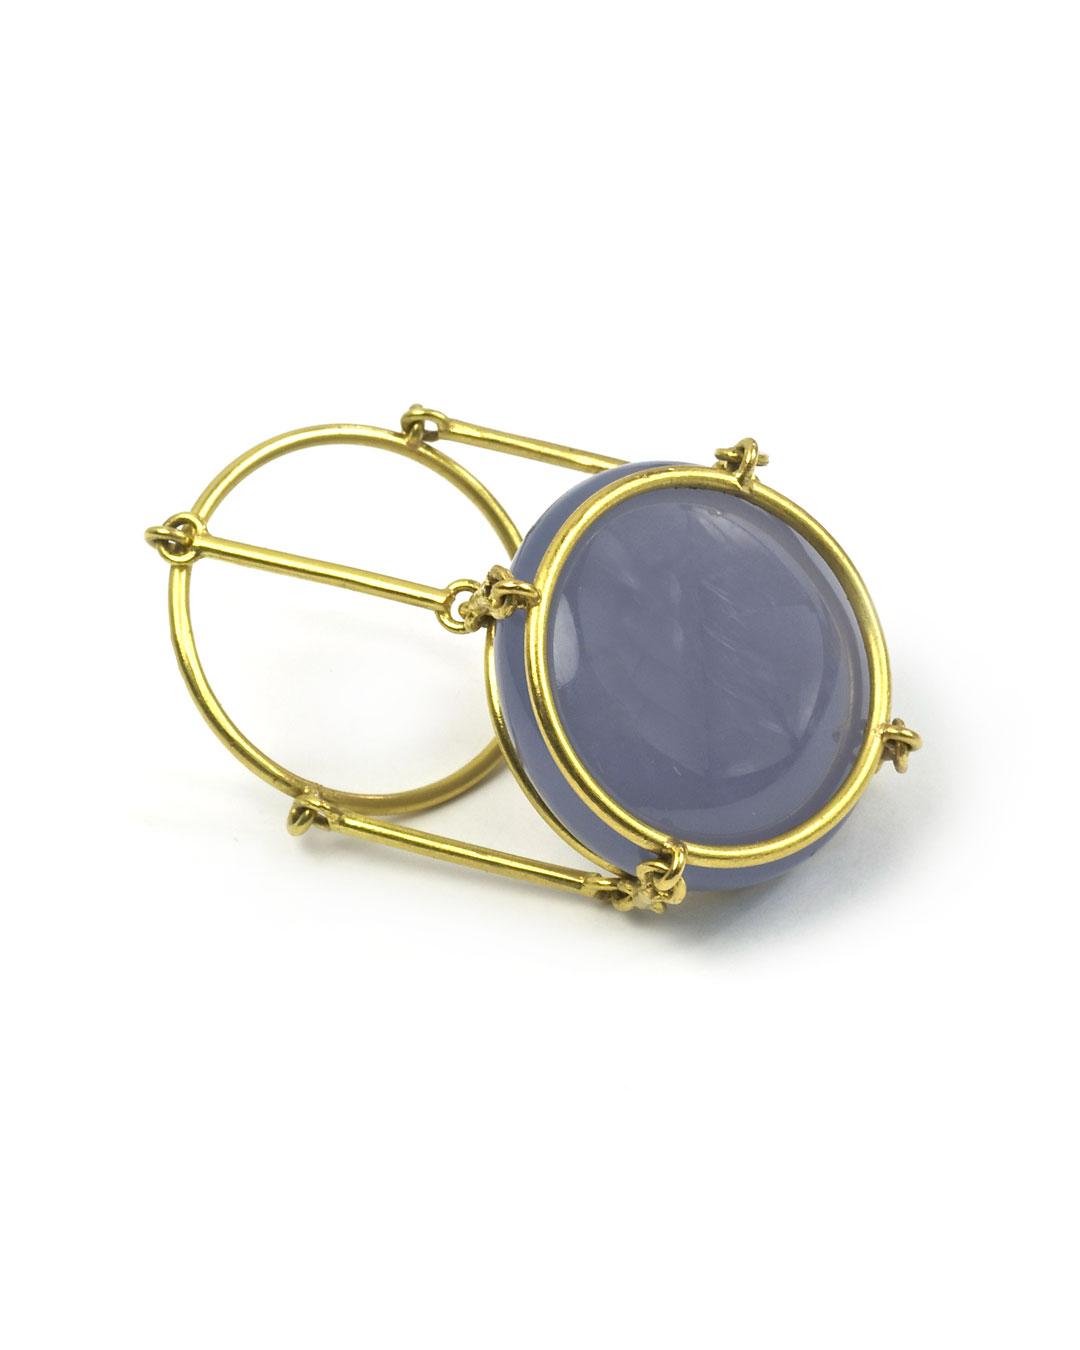 Etsuko Sonobe, untitled, 2006, ring; 20ct gold, blue chalcedony, 28 x 20 mm, €1550